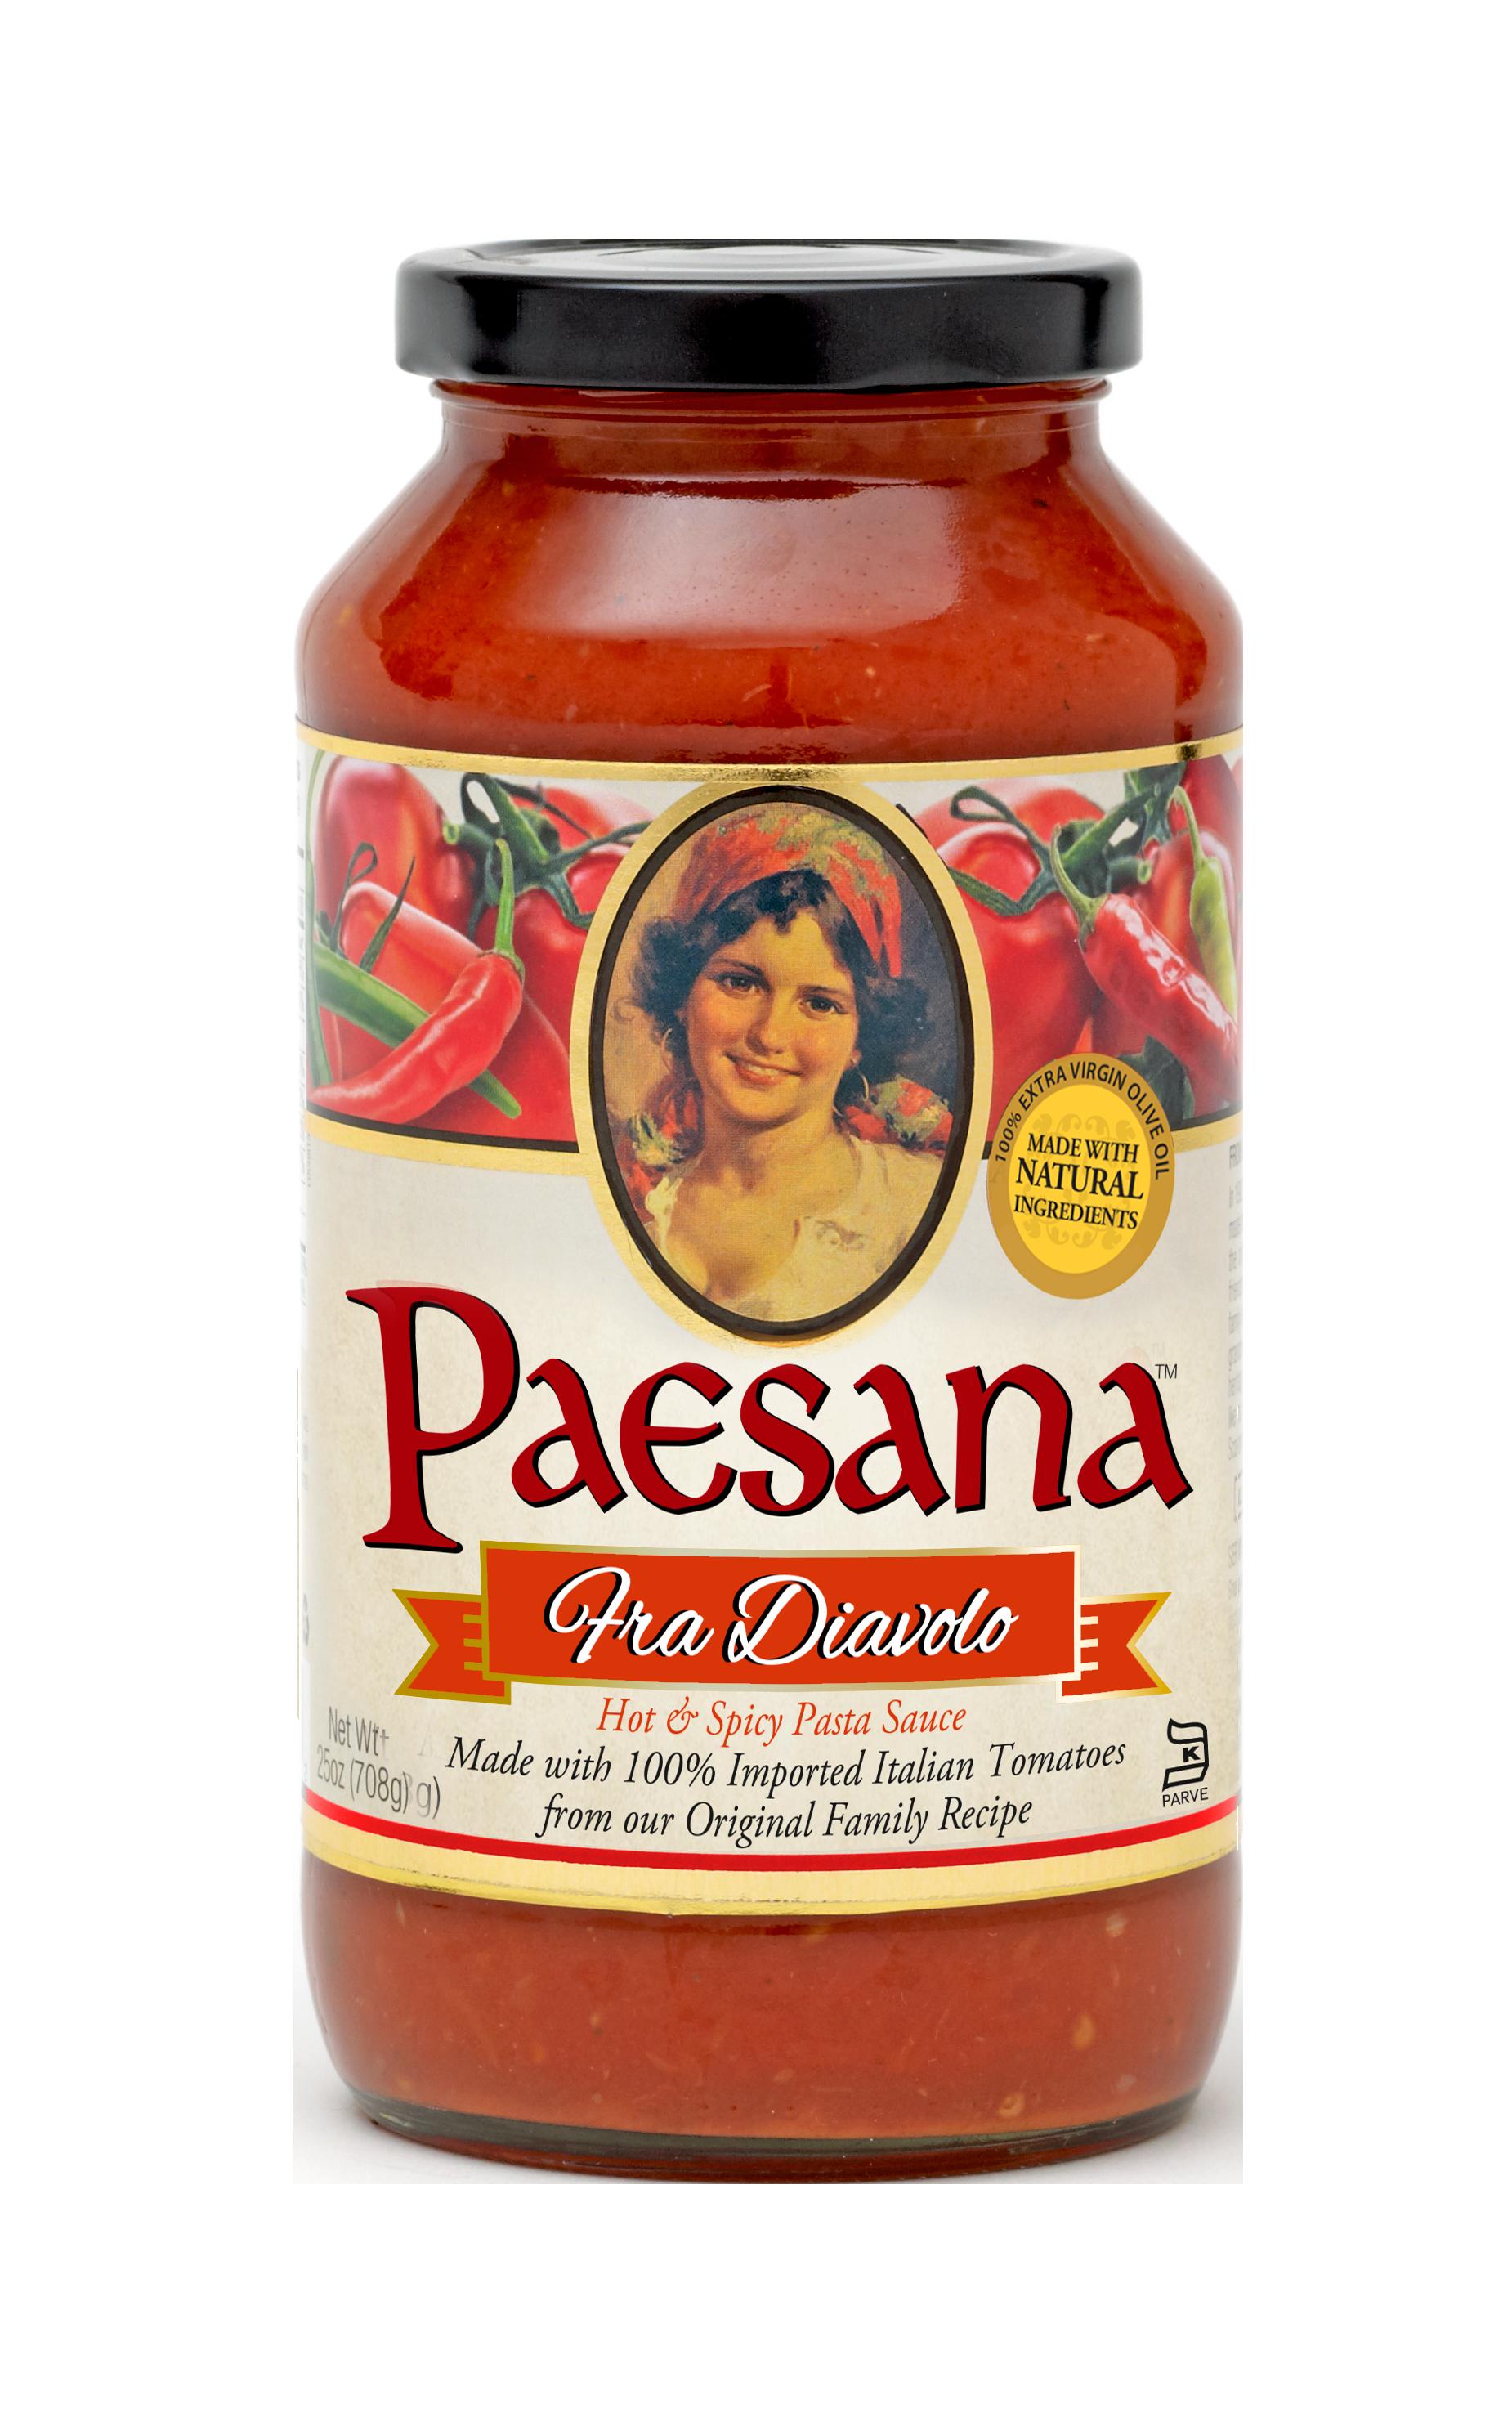 PaesanaFra Diavolo Sauce